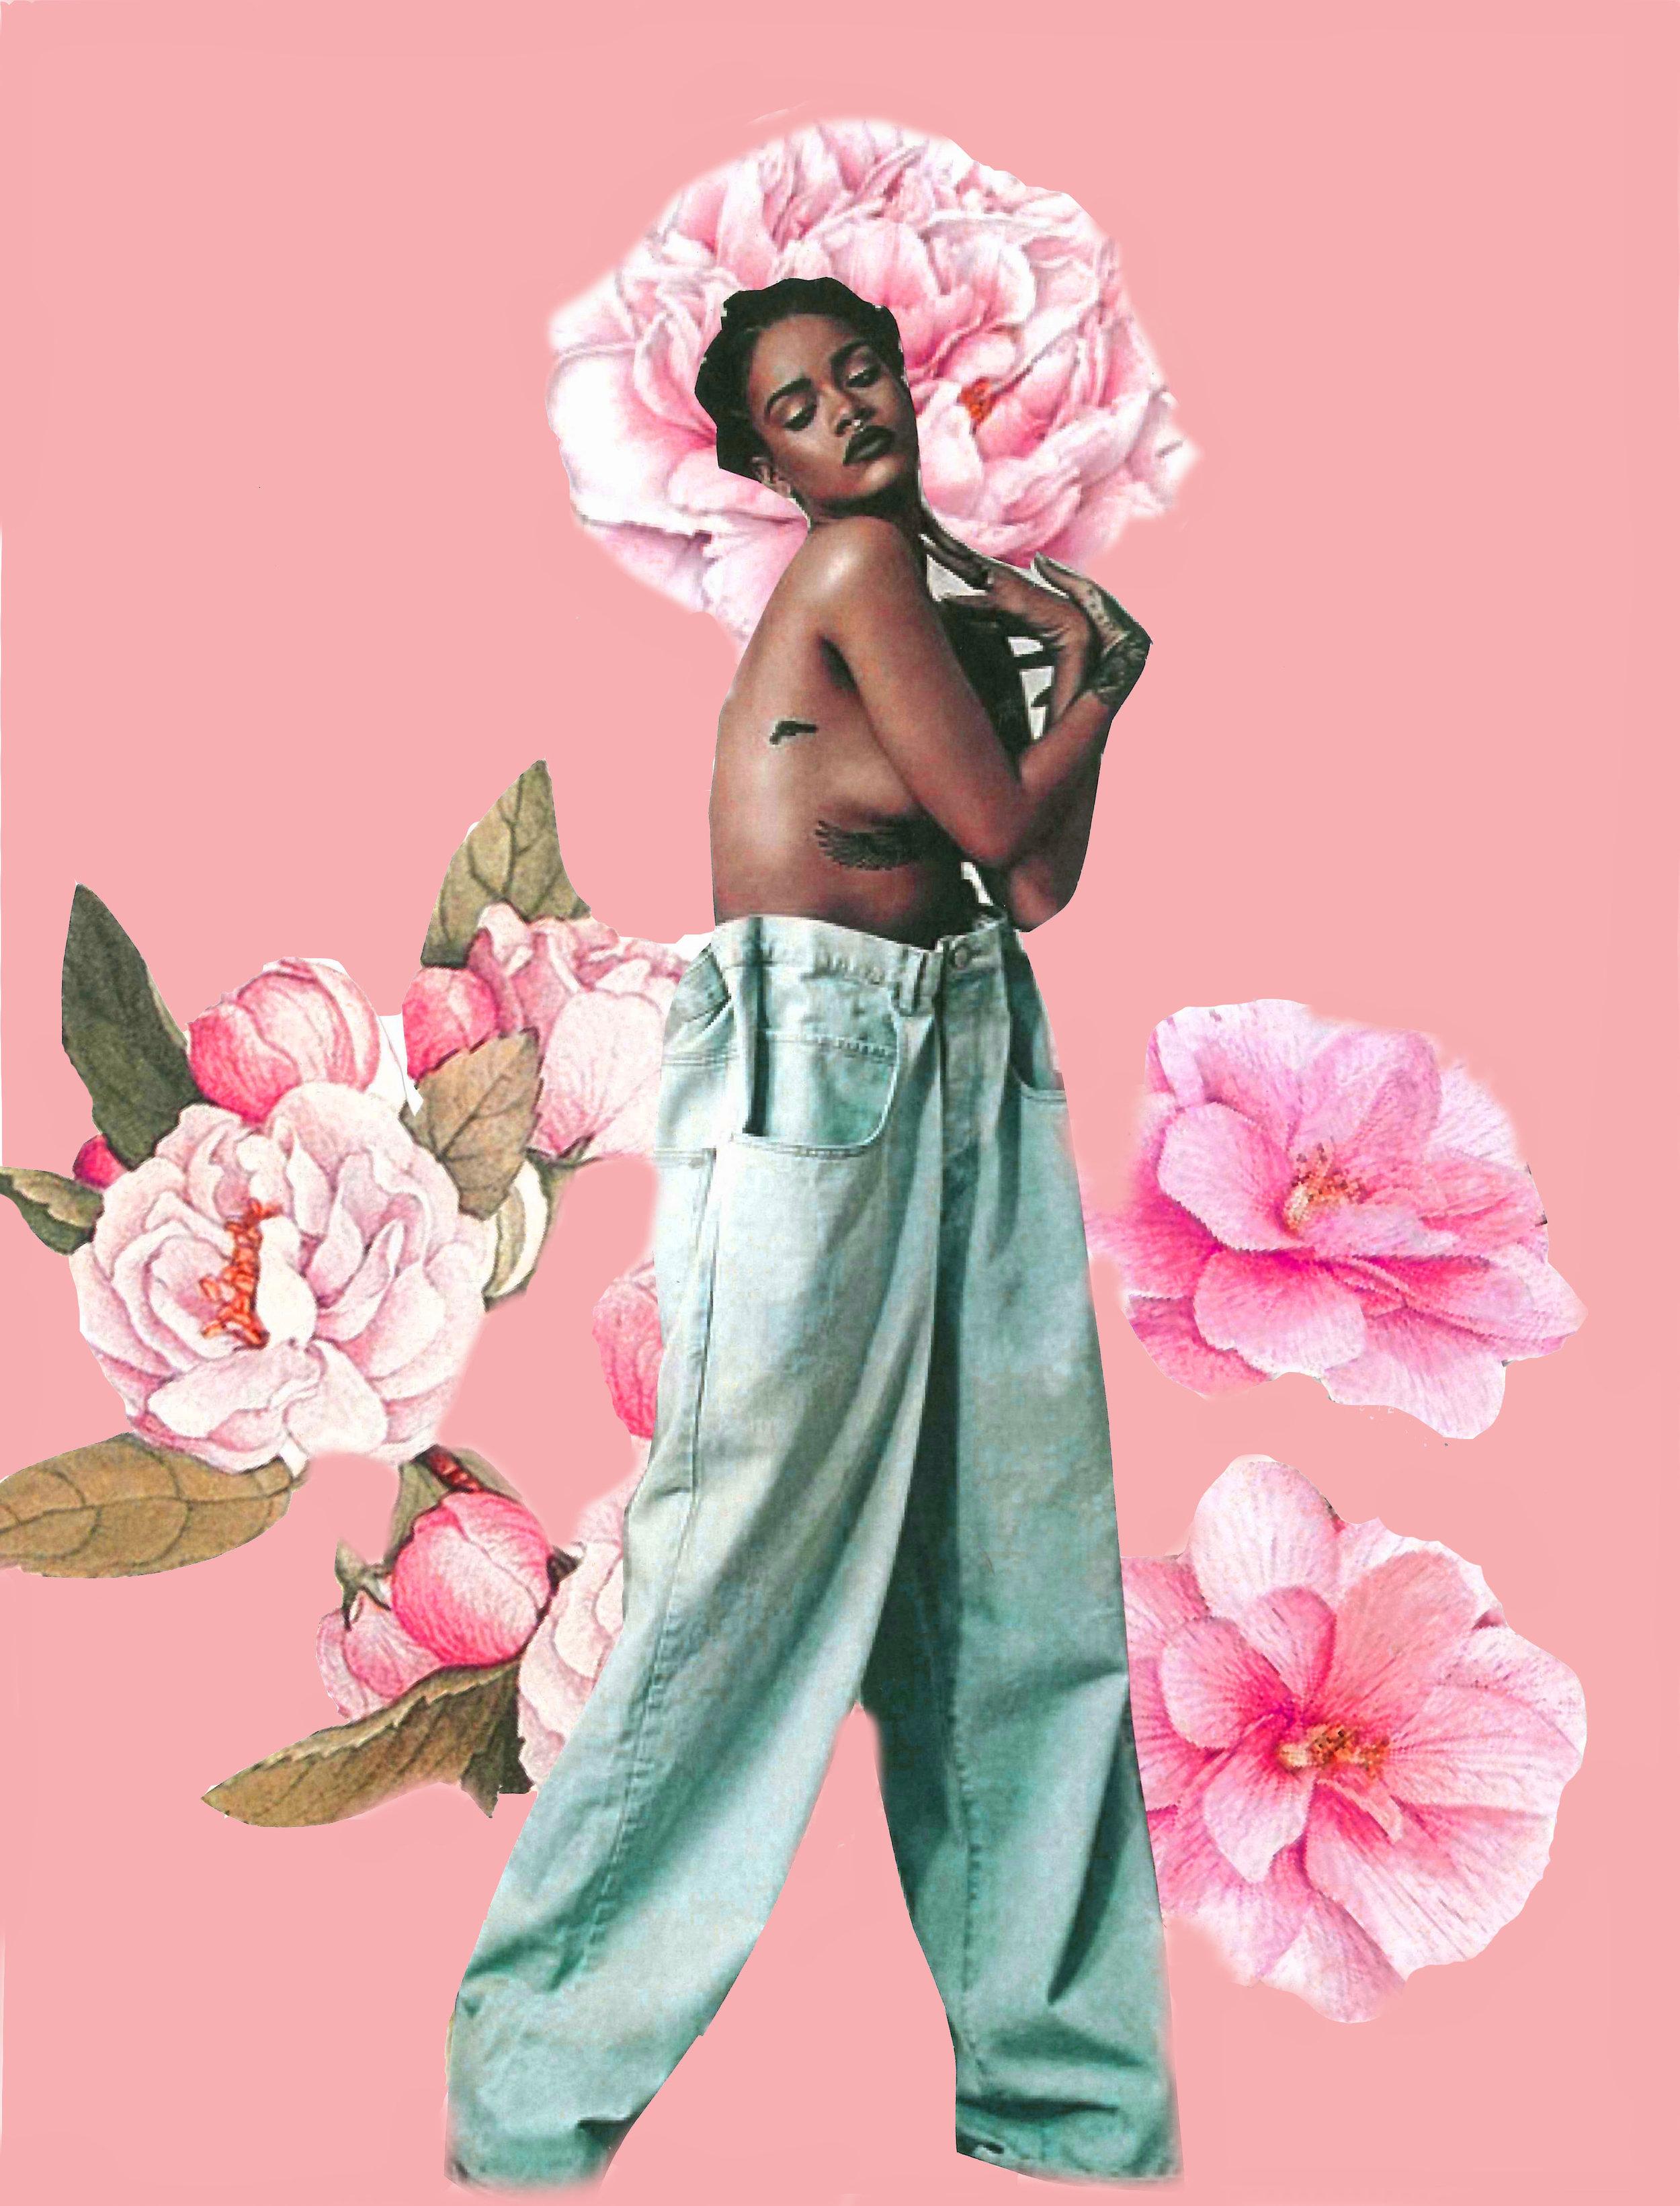 —Illustration by Olivia Engobor  @spookykookyaunty